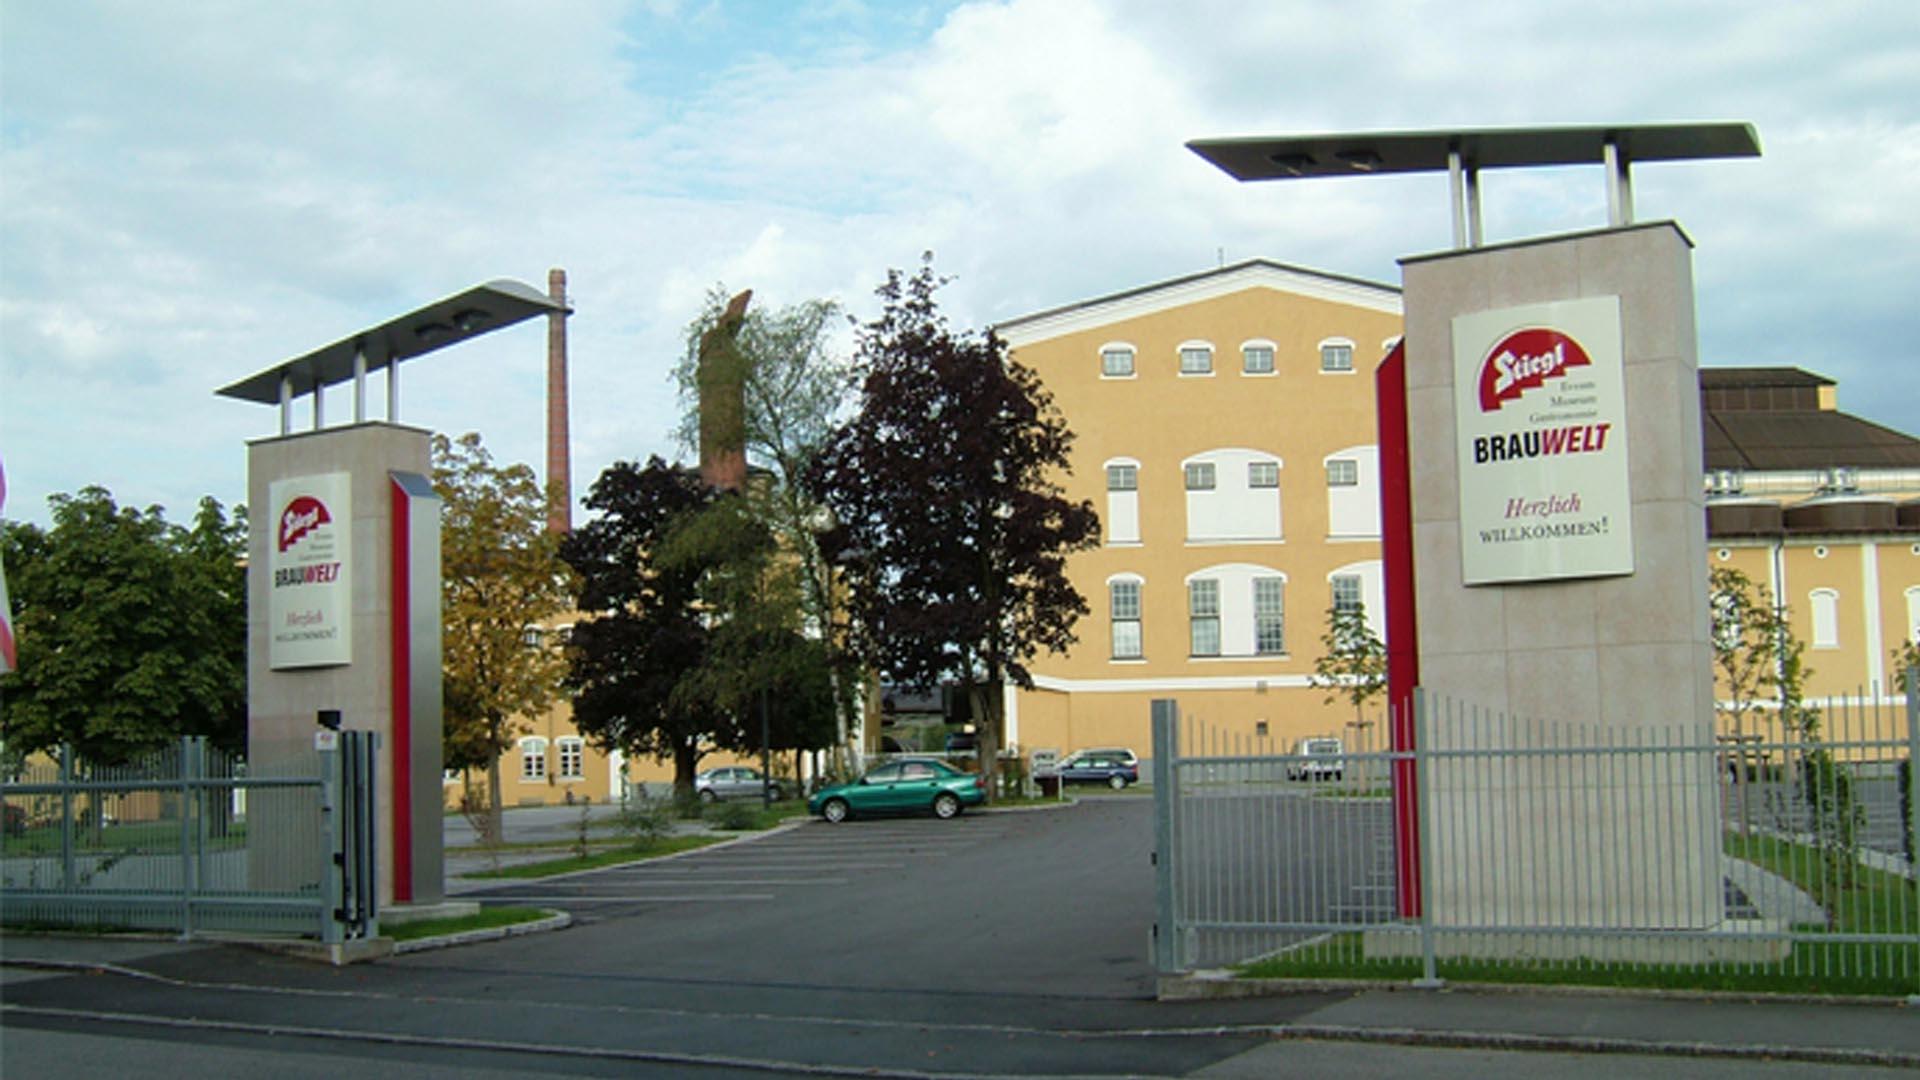 Stiegl-Brauwelt-Parkplatz-Objekt_03